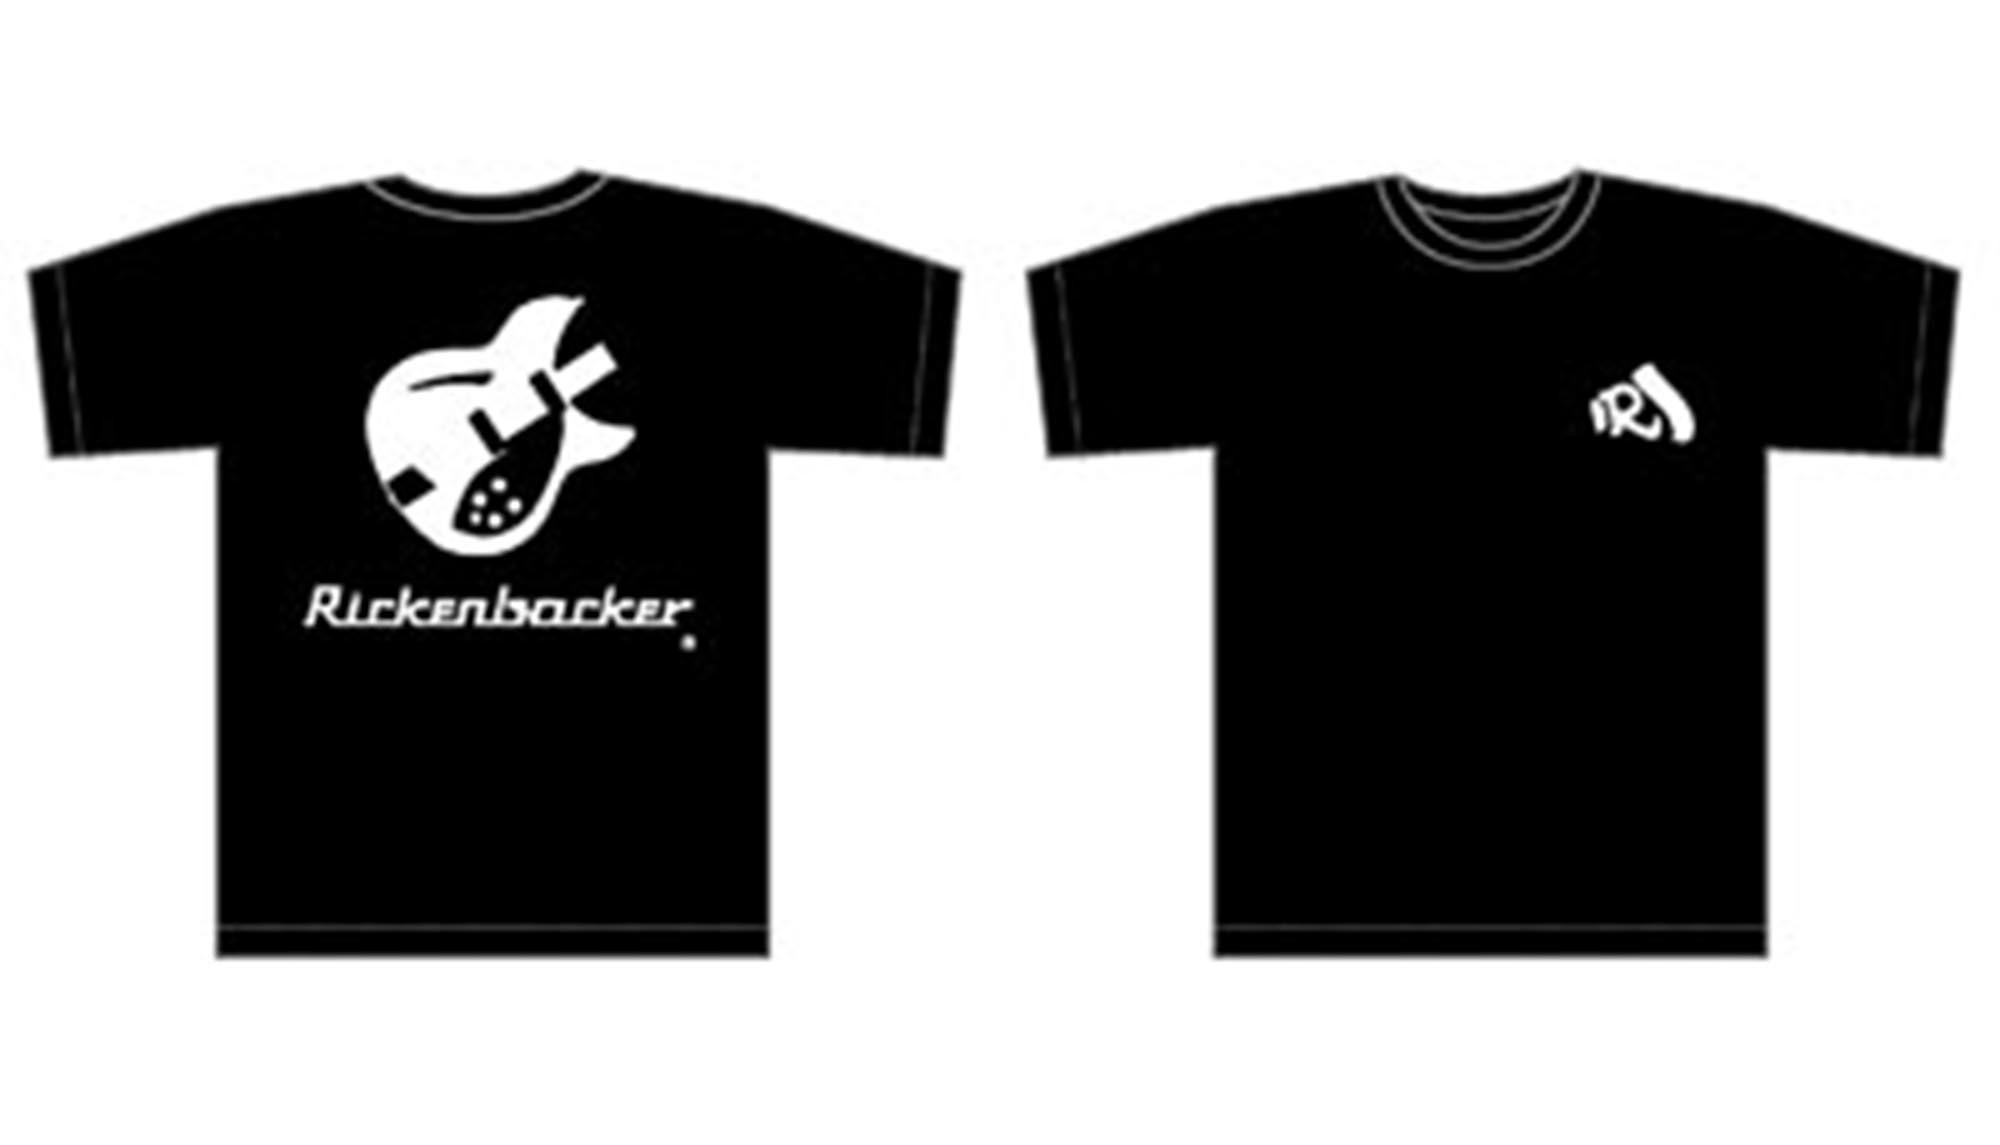 Rickenbacker Guitar T-Shirt - Extra Large